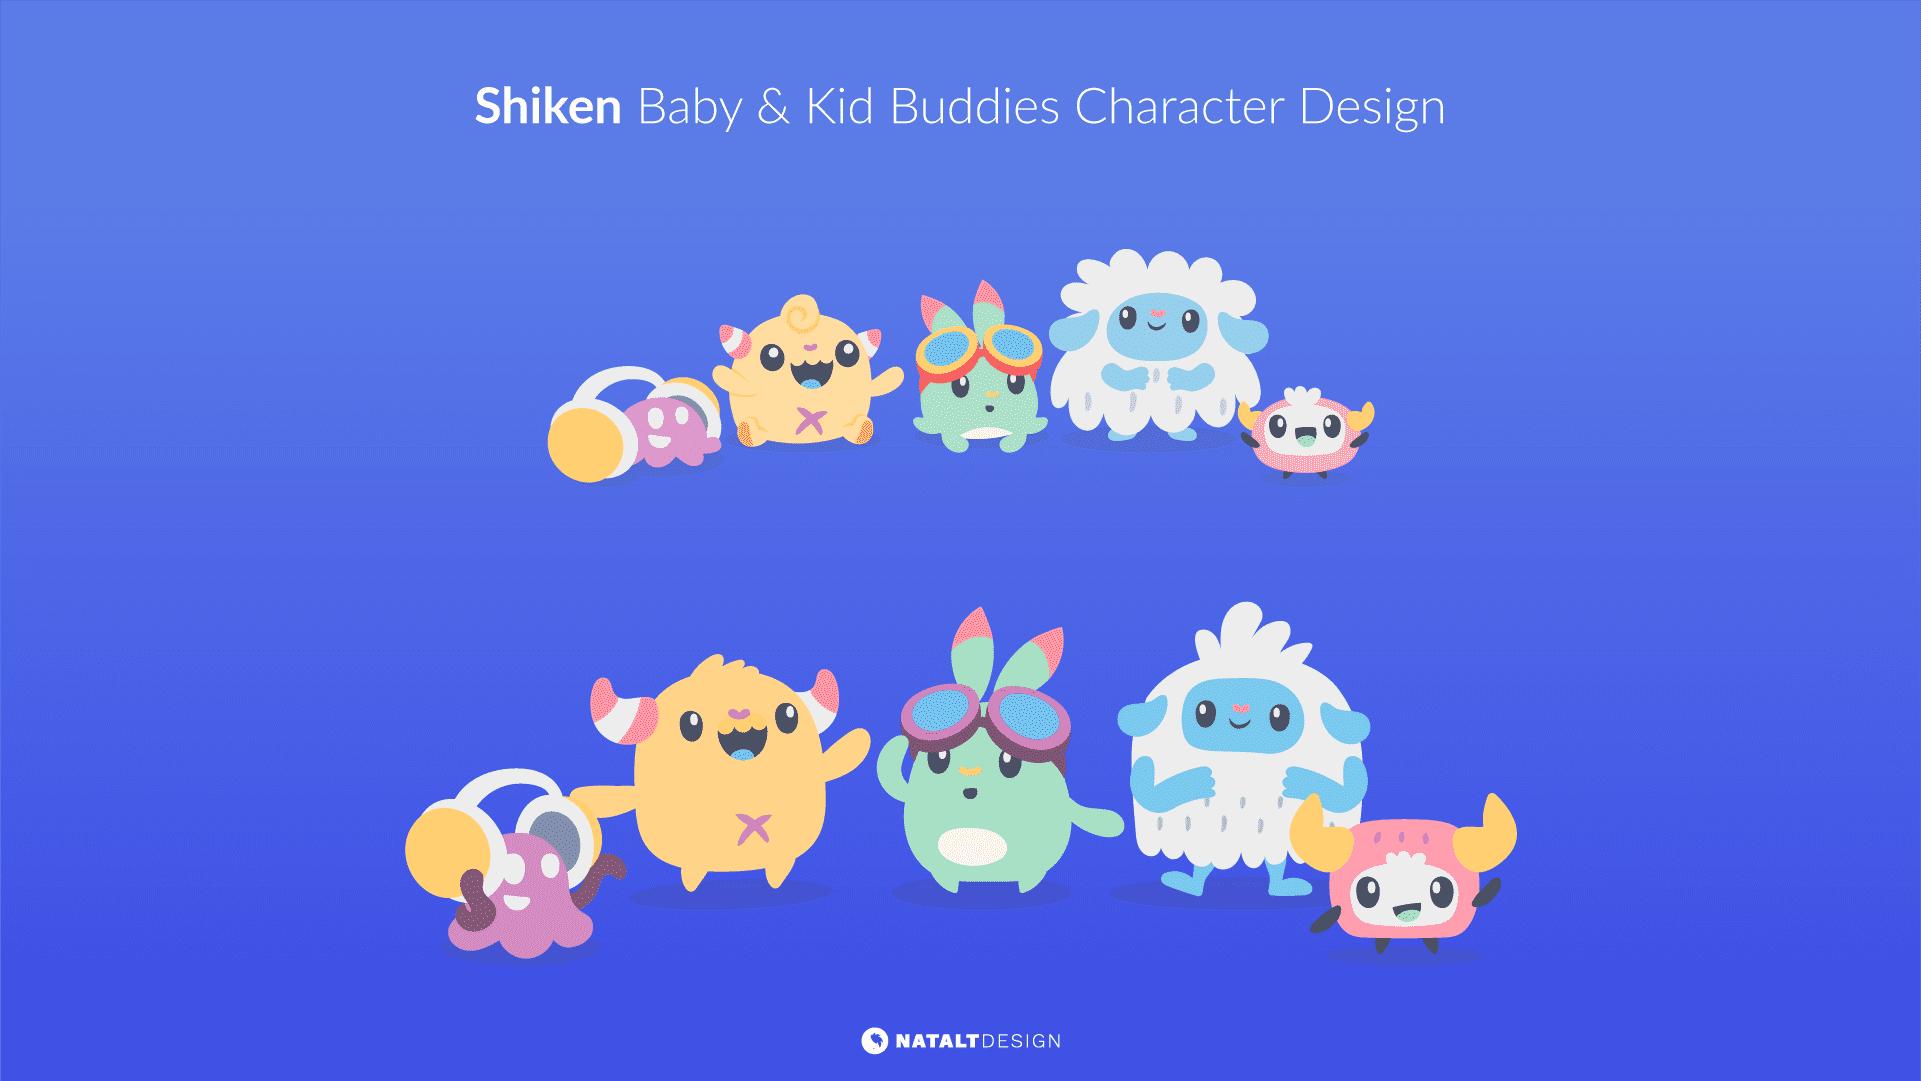 Shiken baby buddies character design